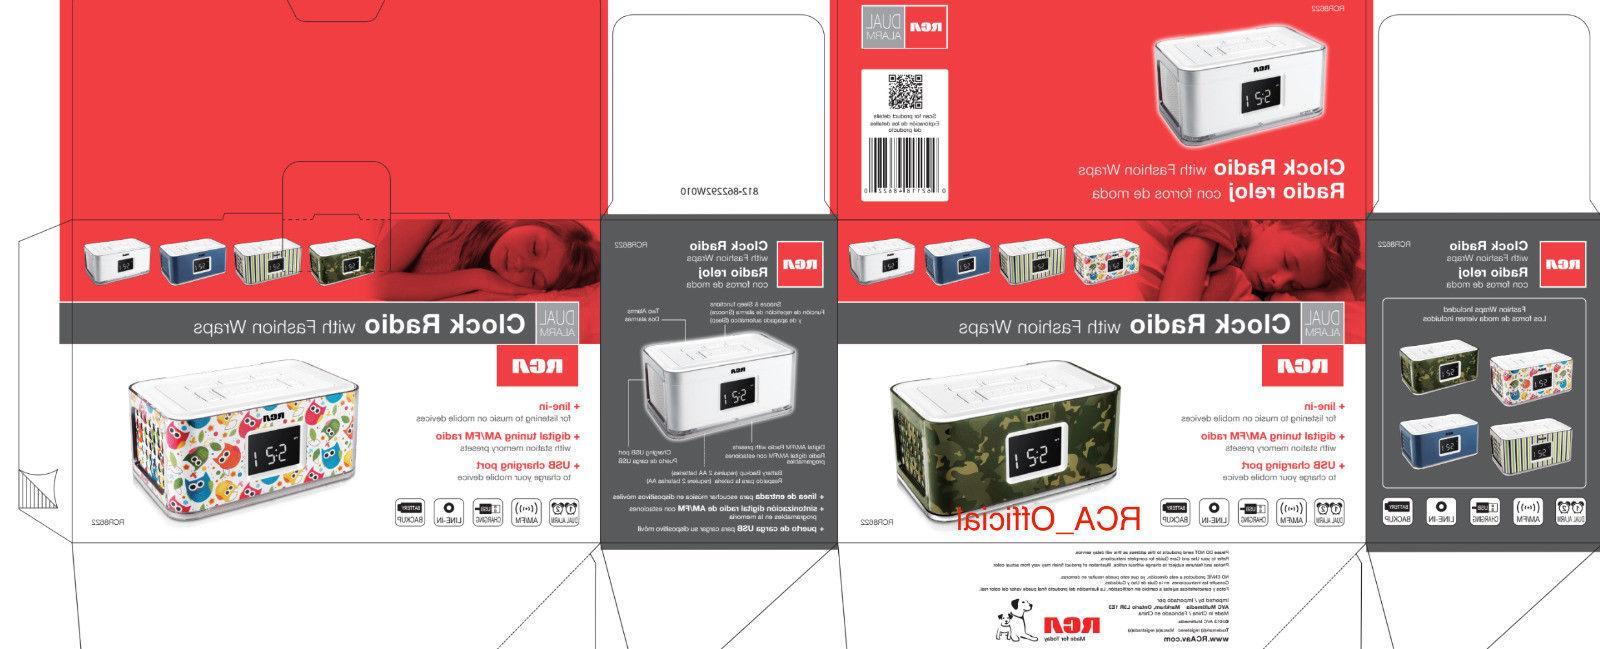 RCA w4 color /phone